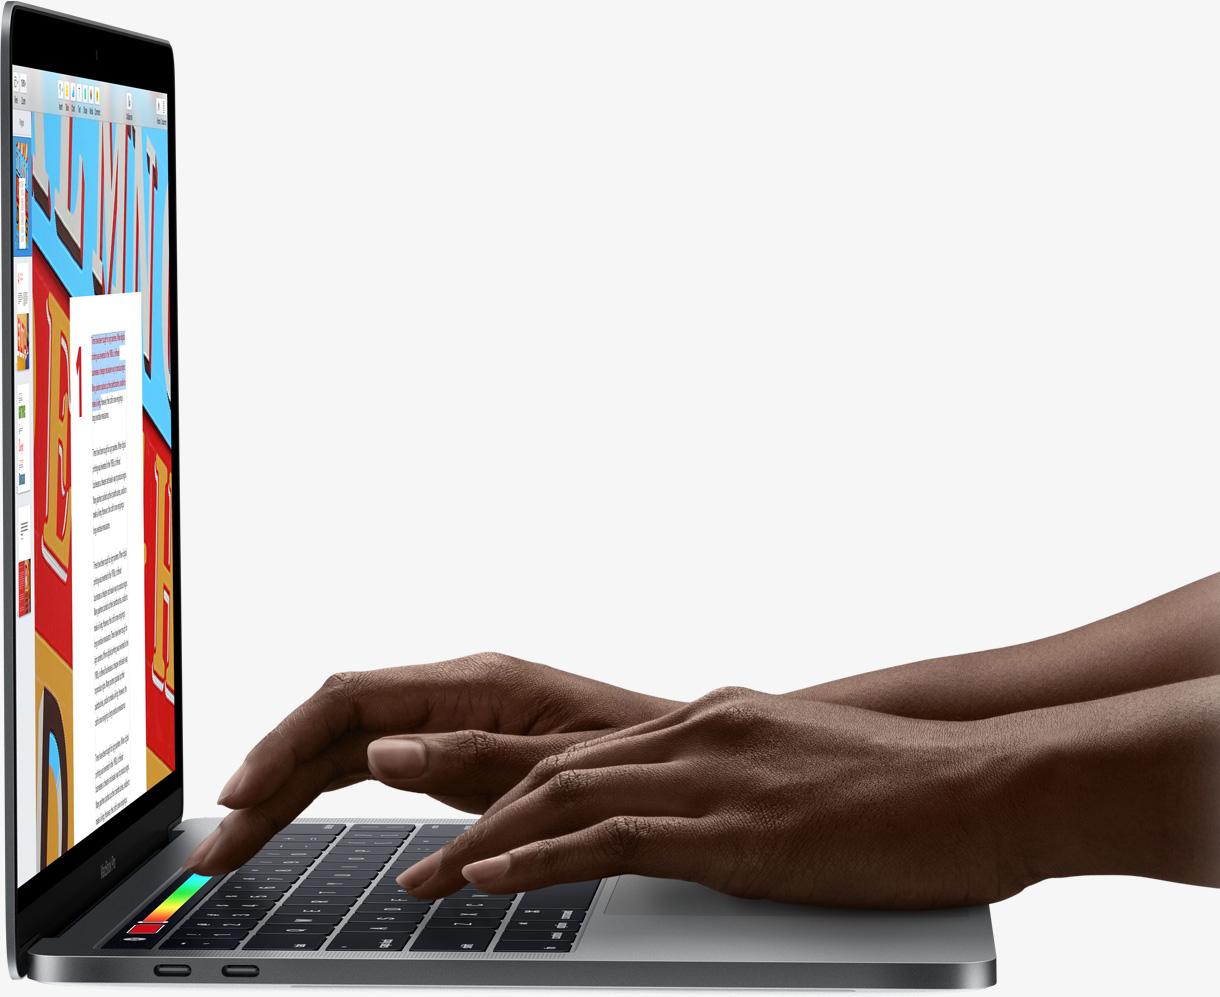 Macbook Pro 15 Apple Touch Bar Retina Mlw82 Notebook 15inch Touchbar Core I7 16gb 512gb Silver Thunderbolt 3